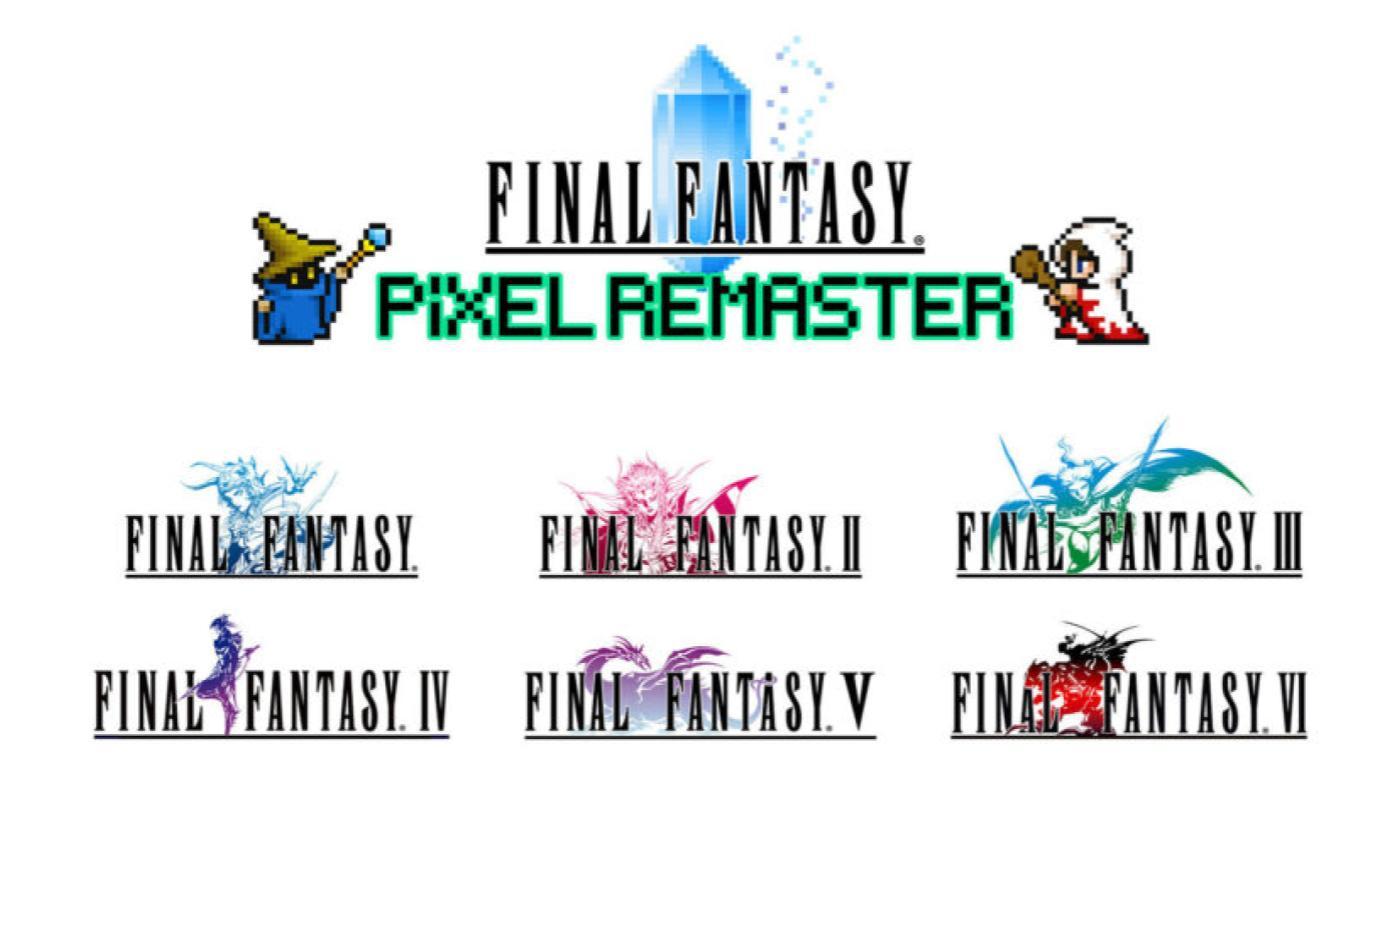 Final Fantasy Pixel Remaster Square Enix